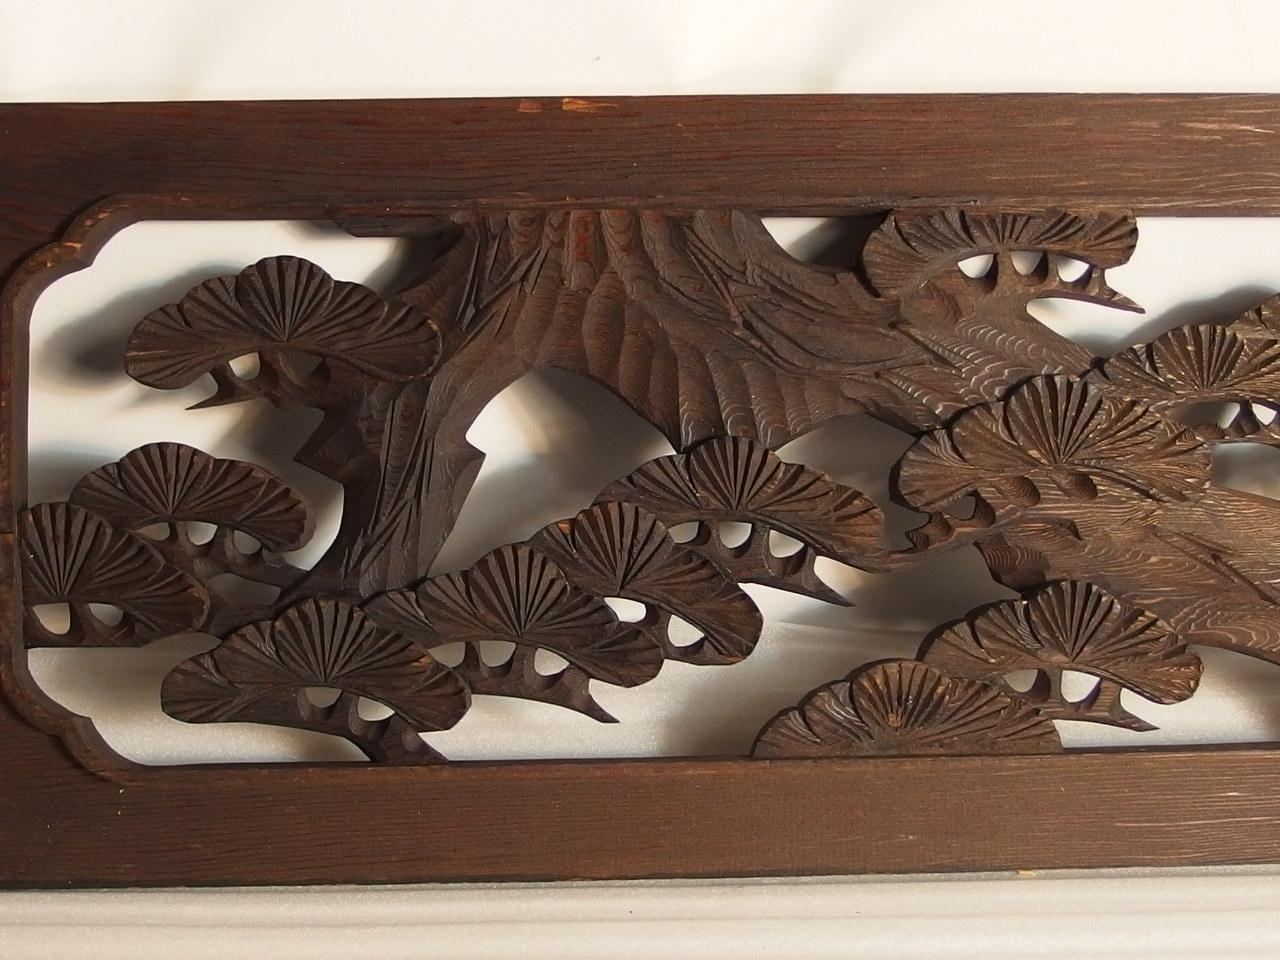 rtk5日本手雕刻木头雕塑漫画中鹰松树